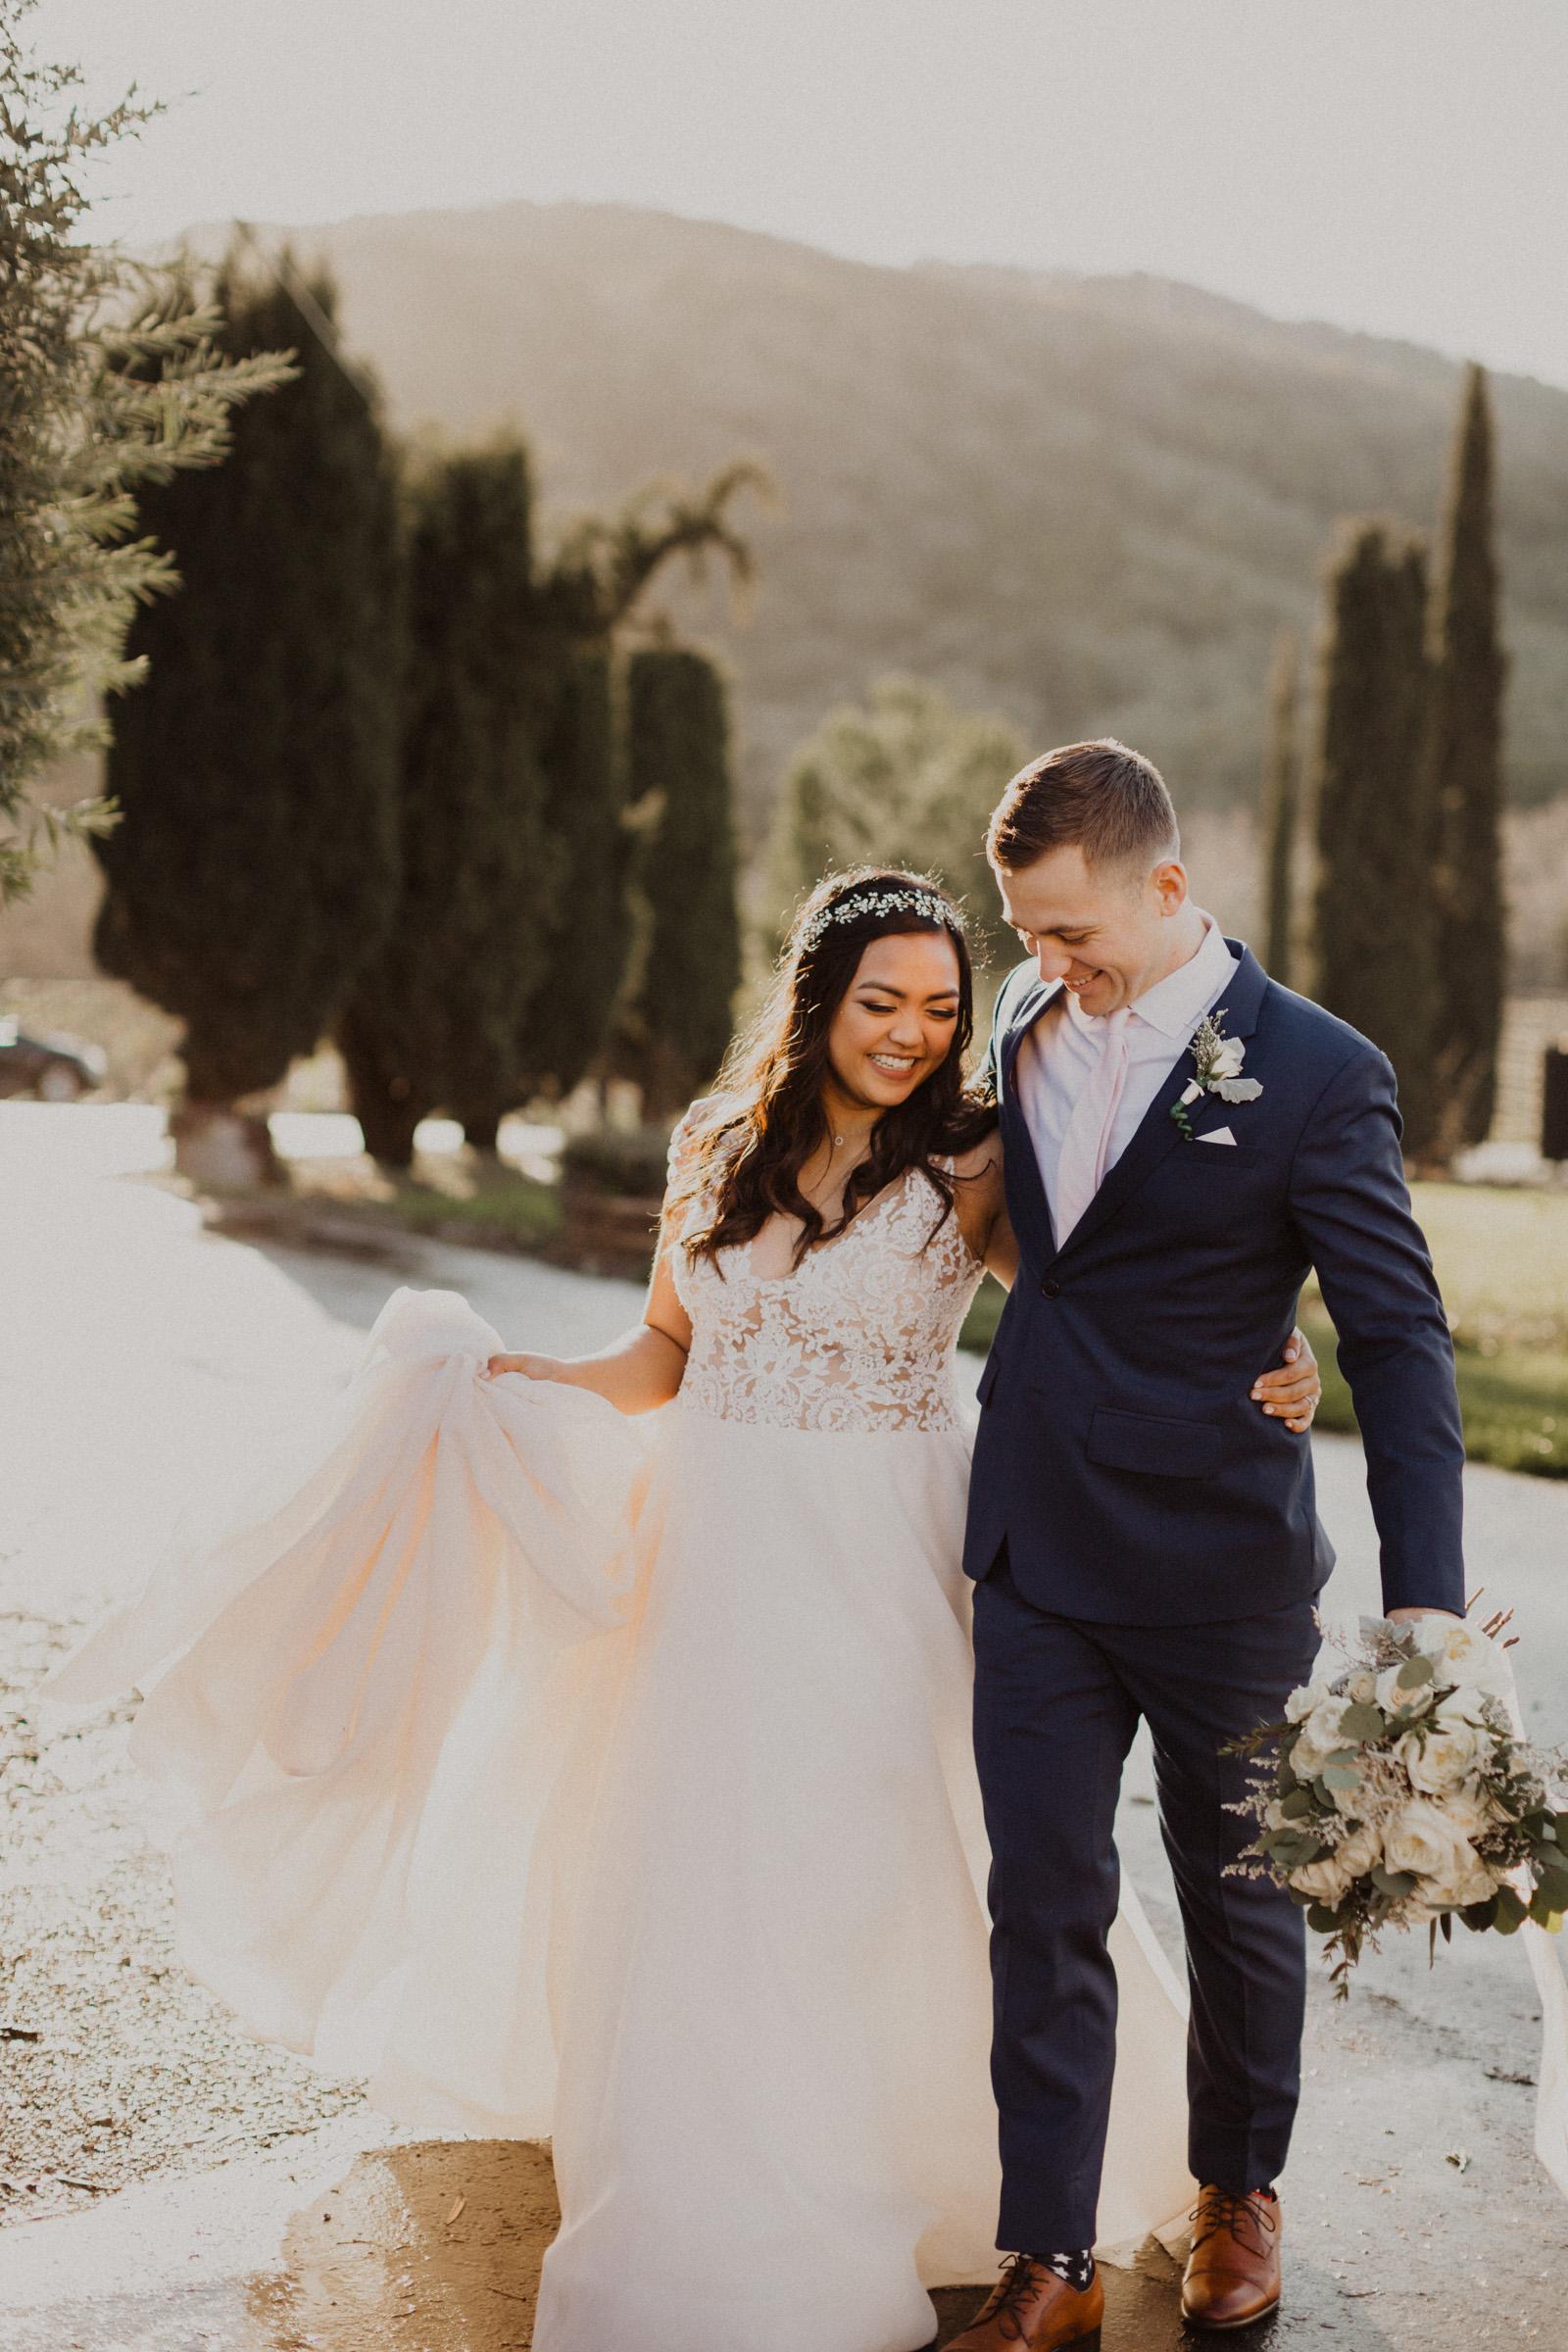 alyssa barletter photography destination wedding bay area san jose california winery photographer-61.jpg